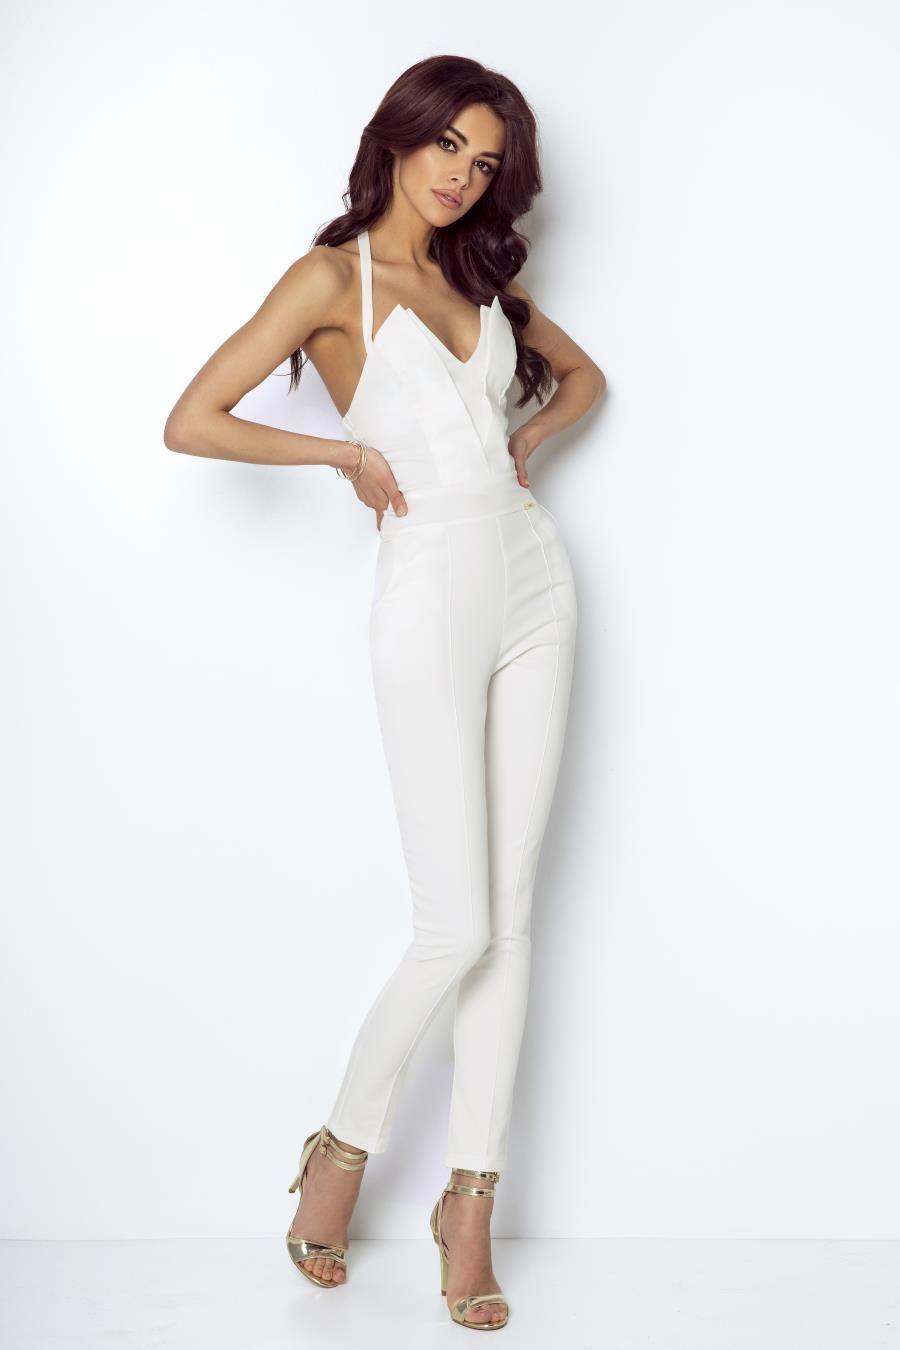 Stylowy Kombinezon Smietankowy T09 Plus Size Summer Outfit Coveralls Women Outfits